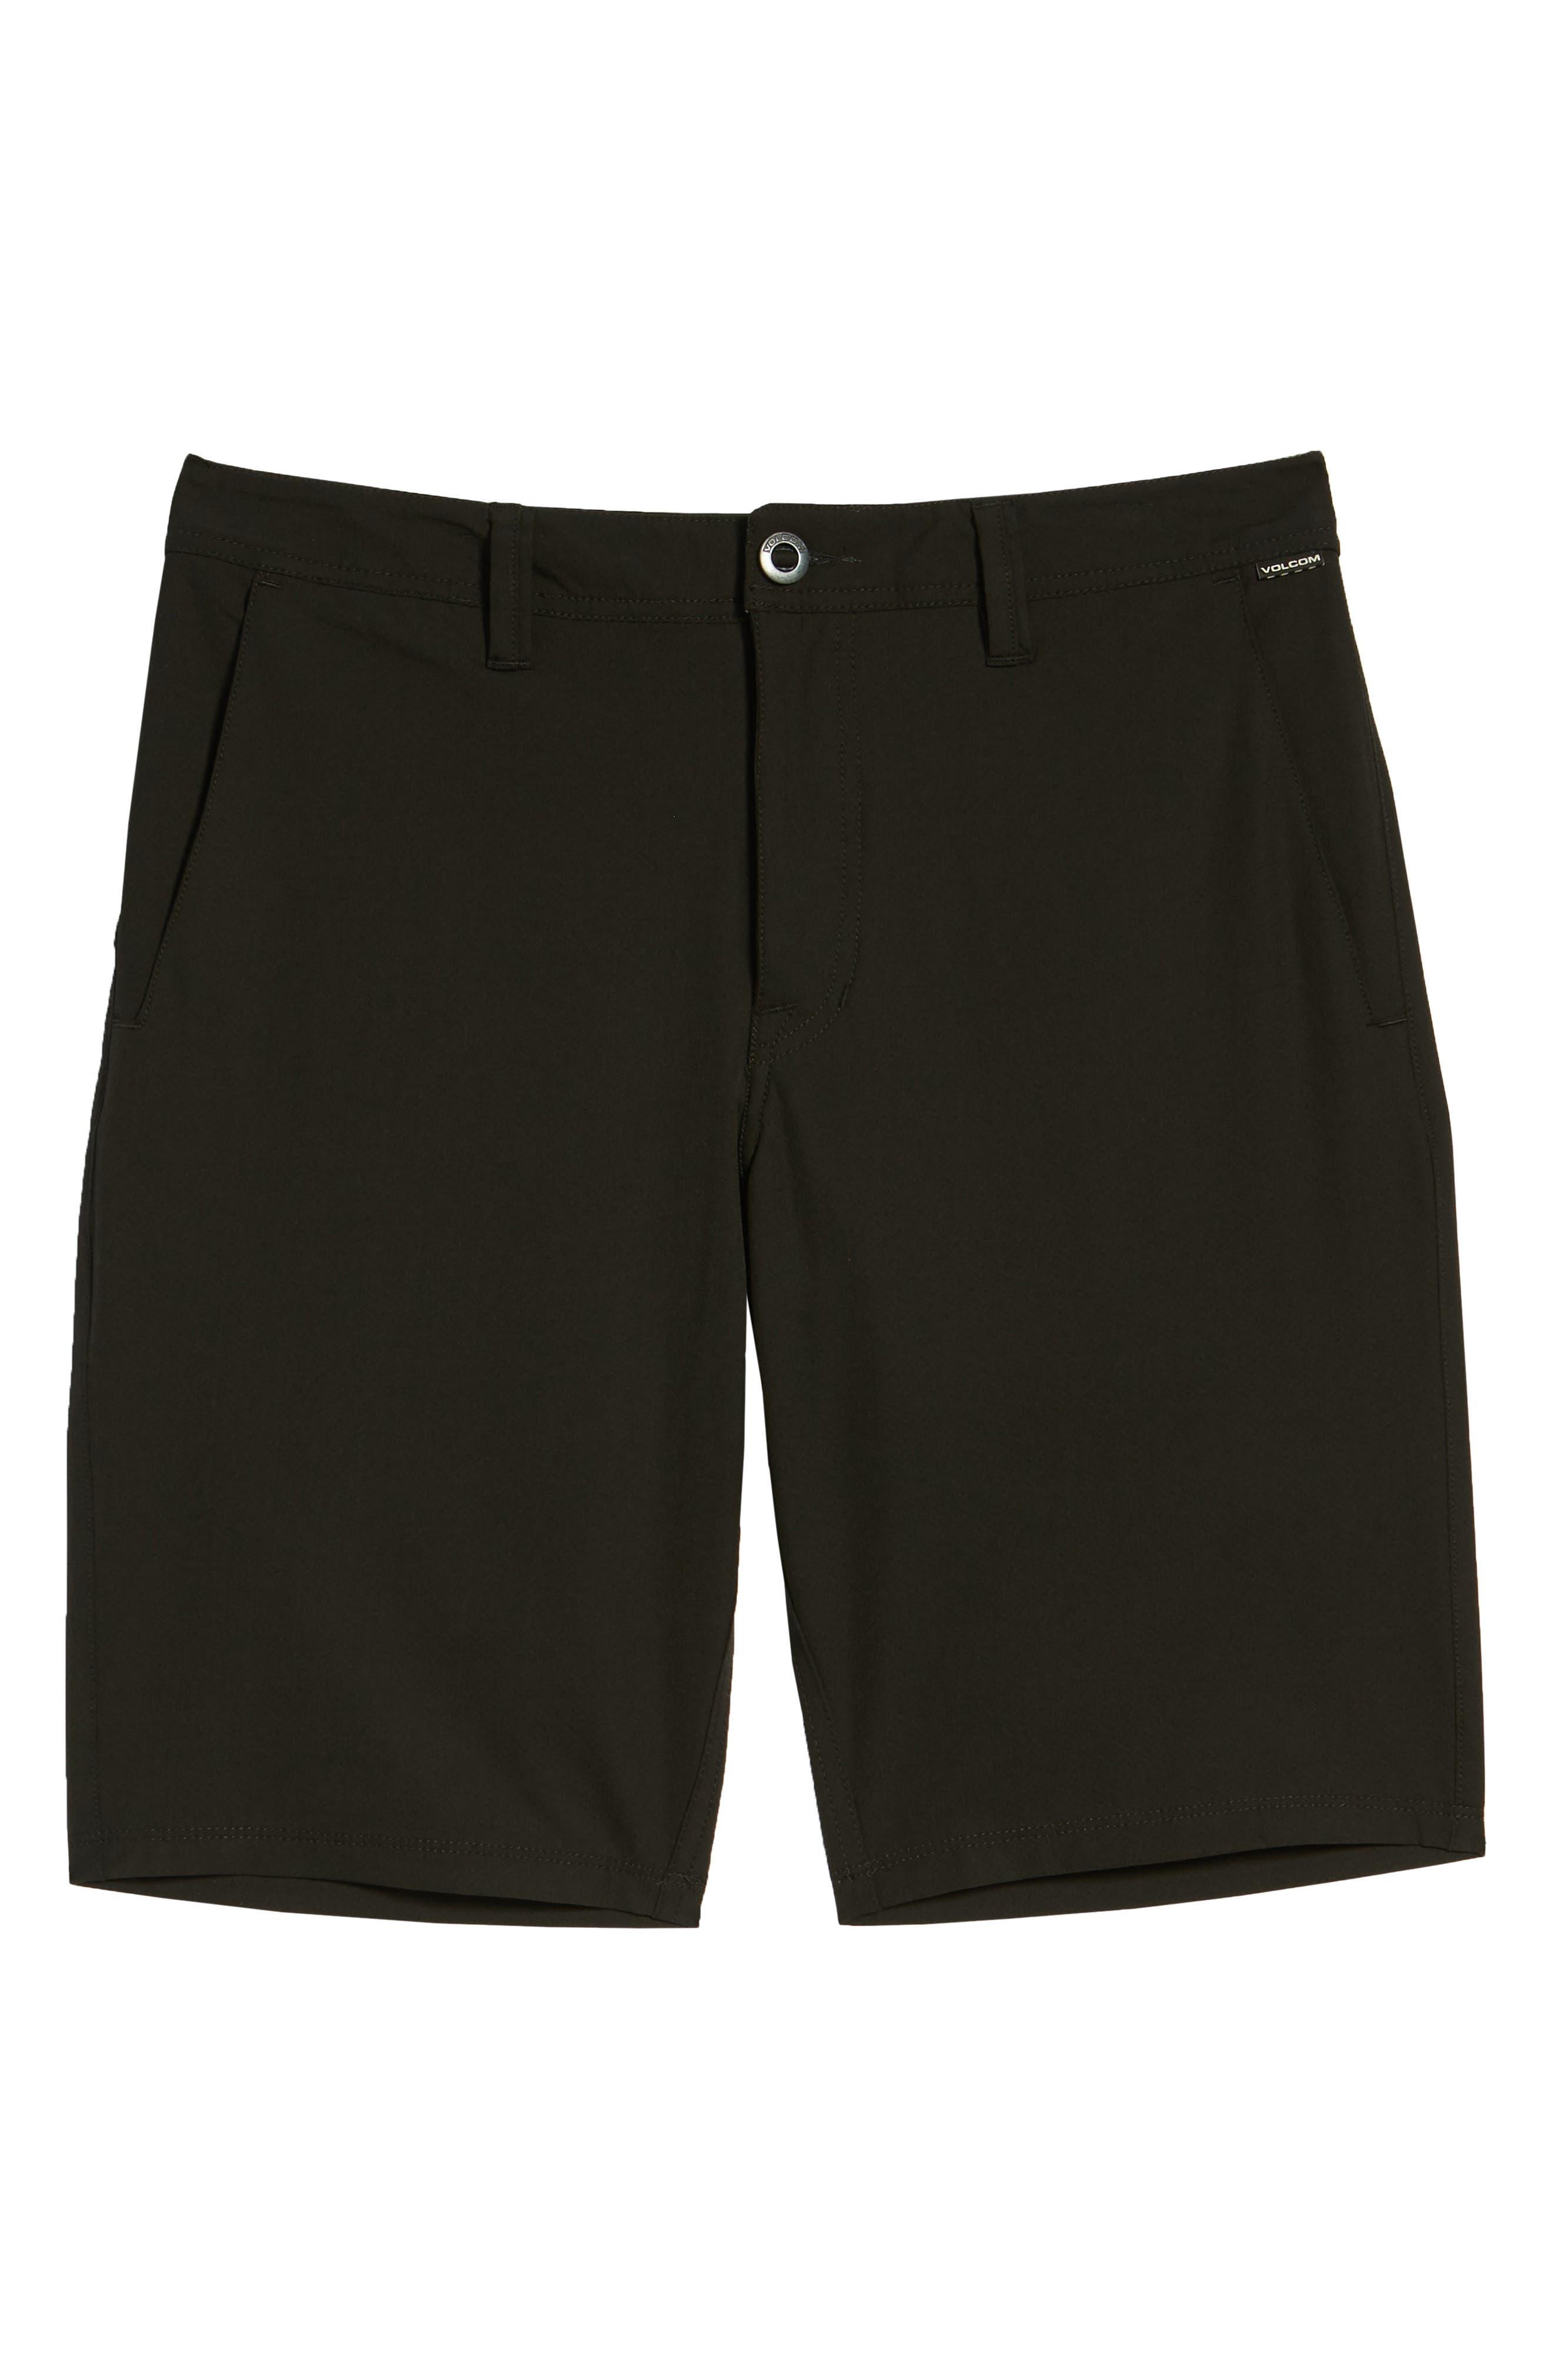 SNT Dry Hybrid Shorts,                             Alternate thumbnail 6, color,                             001